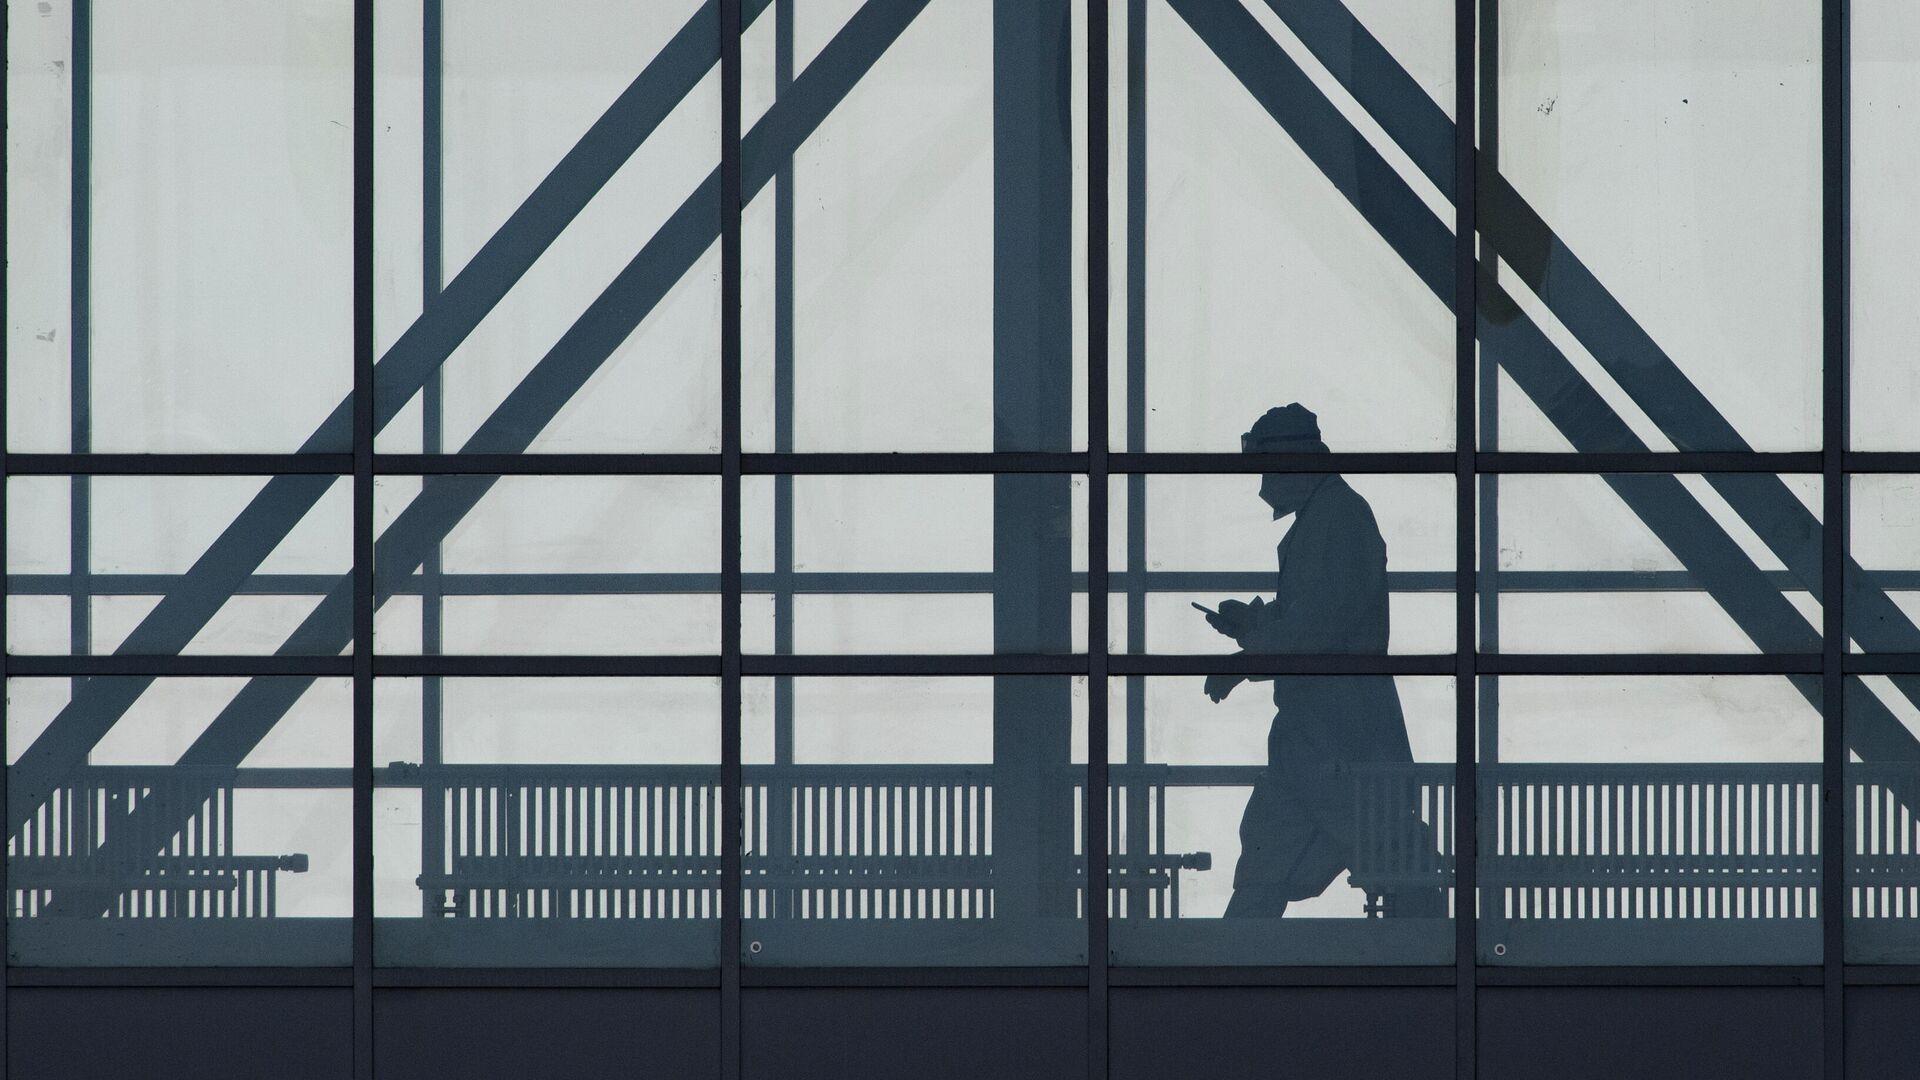 Медицинский работник в здании карантинного центра в Коммунарке - РИА Новости, 1920, 06.10.2020